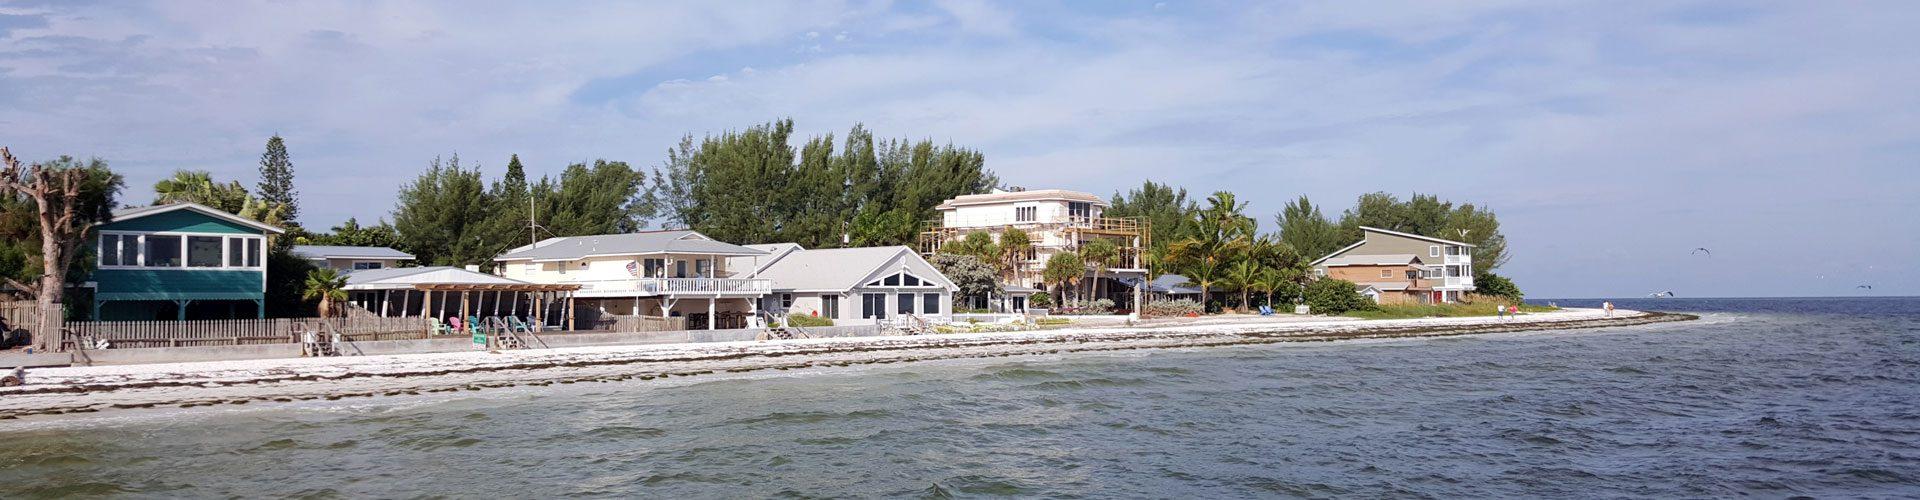 North Shore Drive, Anna Maria Island, Florida